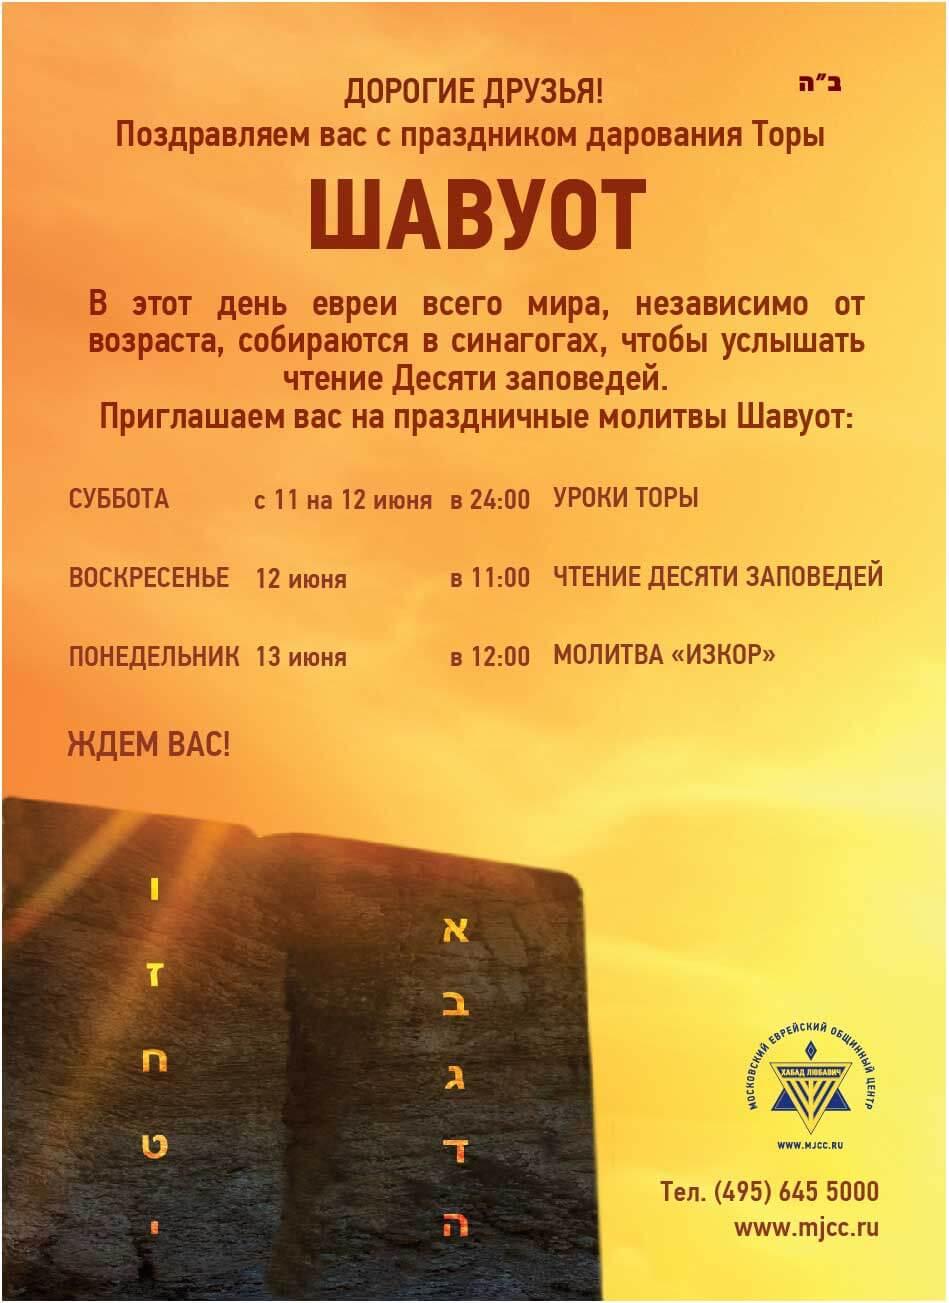 shavuot-2016-1